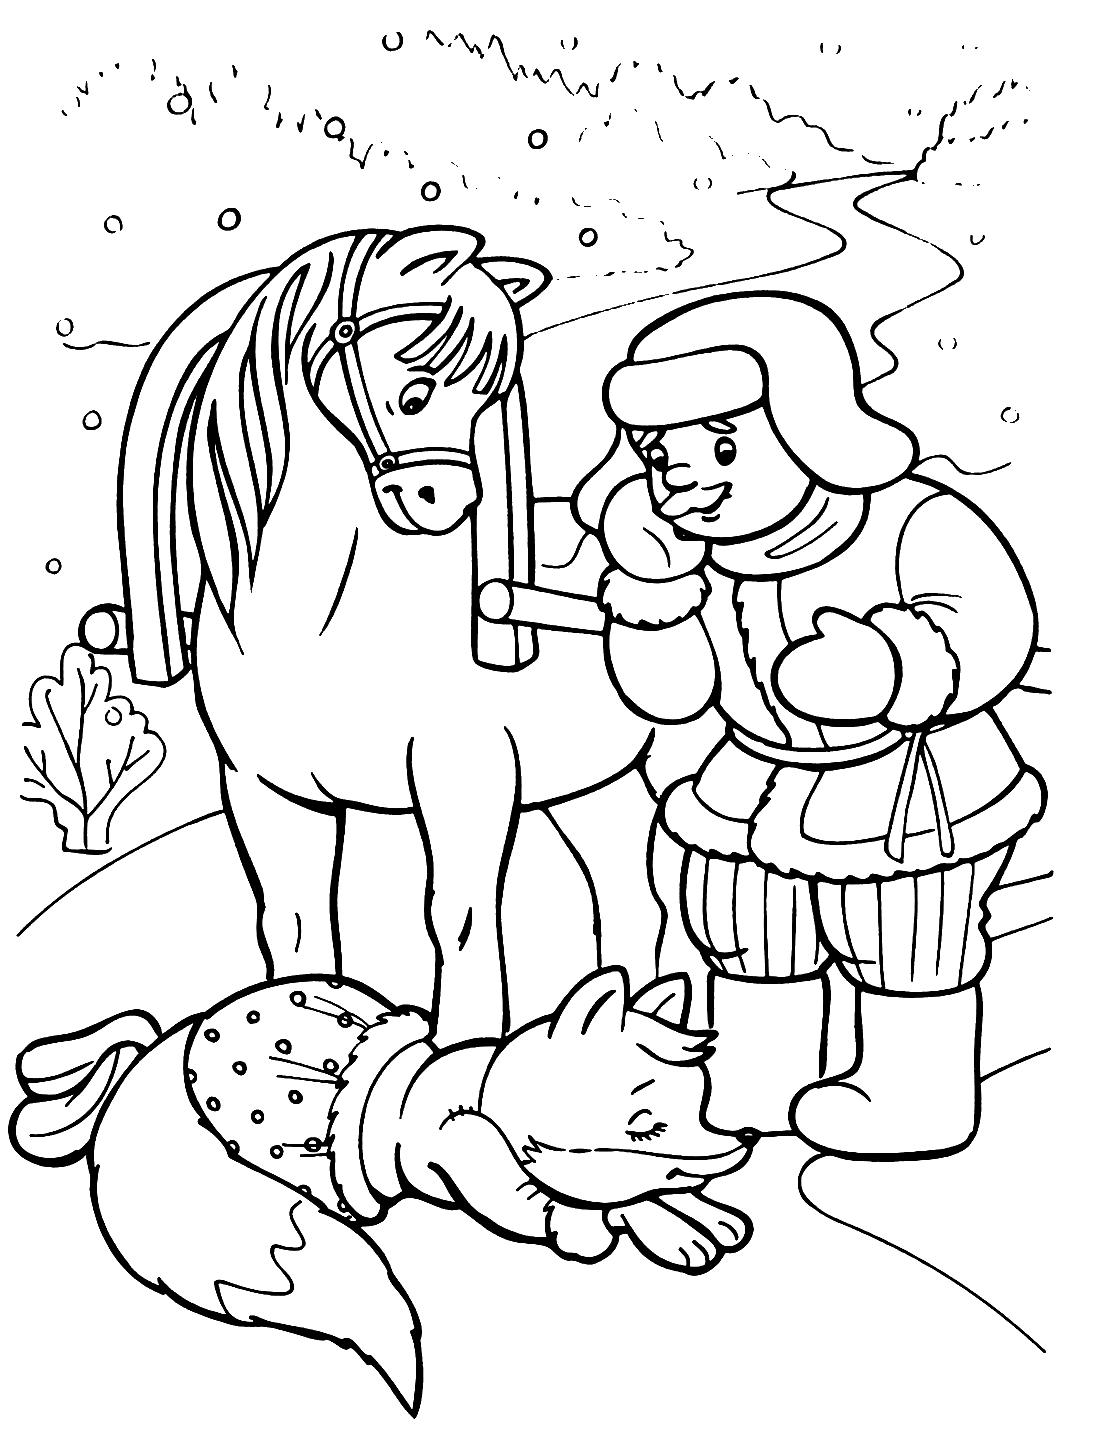 Лиса и мужик - раскраска №658 | Printonic.ru